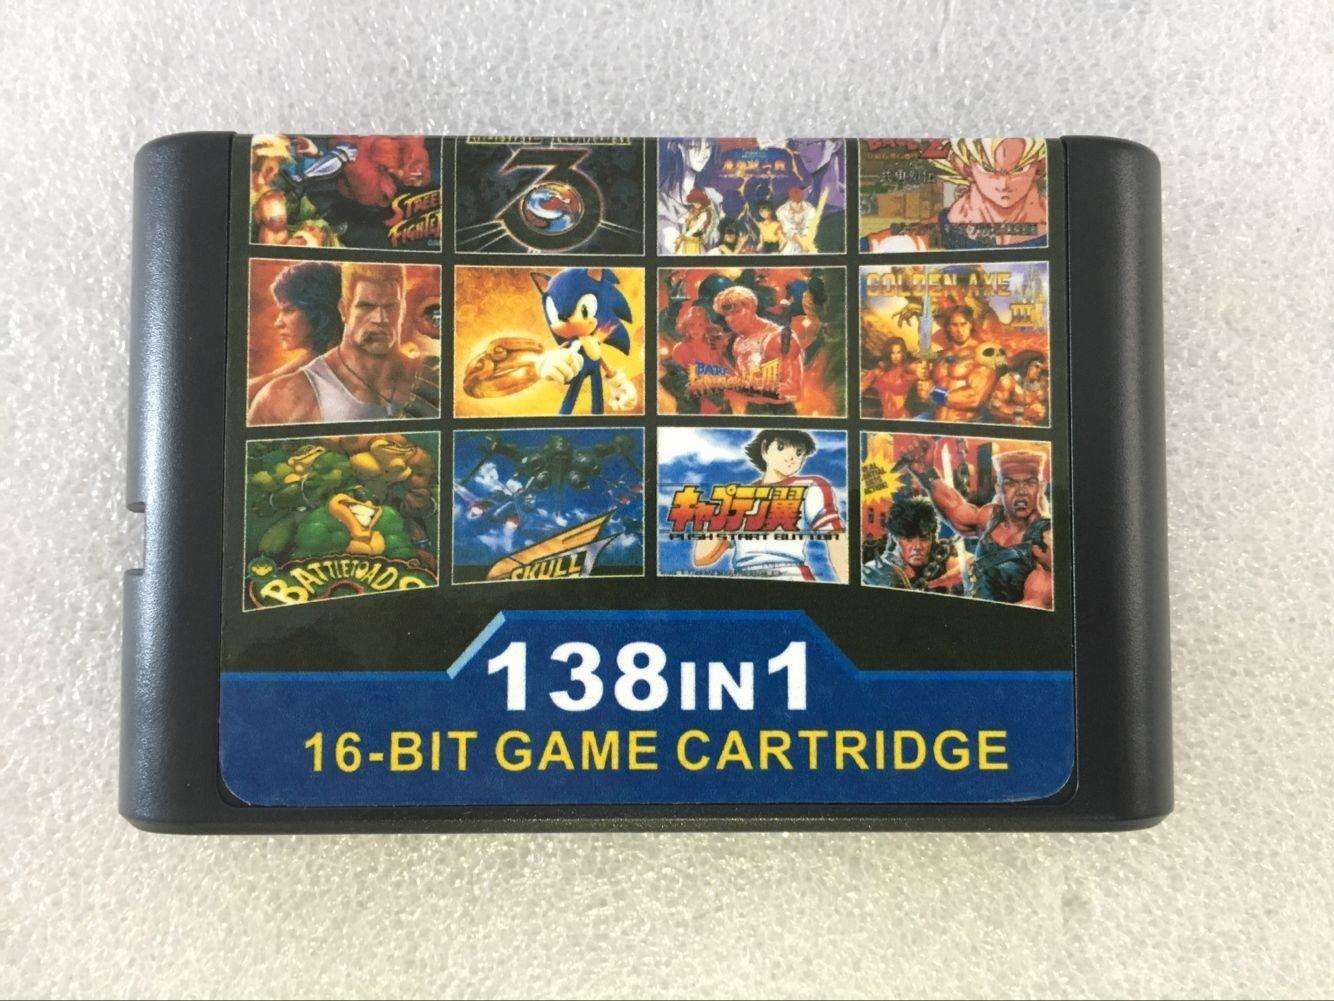 Super 138 in 1 Games Sega Megadrive Genesis 16 bit Game Cartridge tv Game Video Game with Super Street Figher 2 Turtles 3 Thunder Force